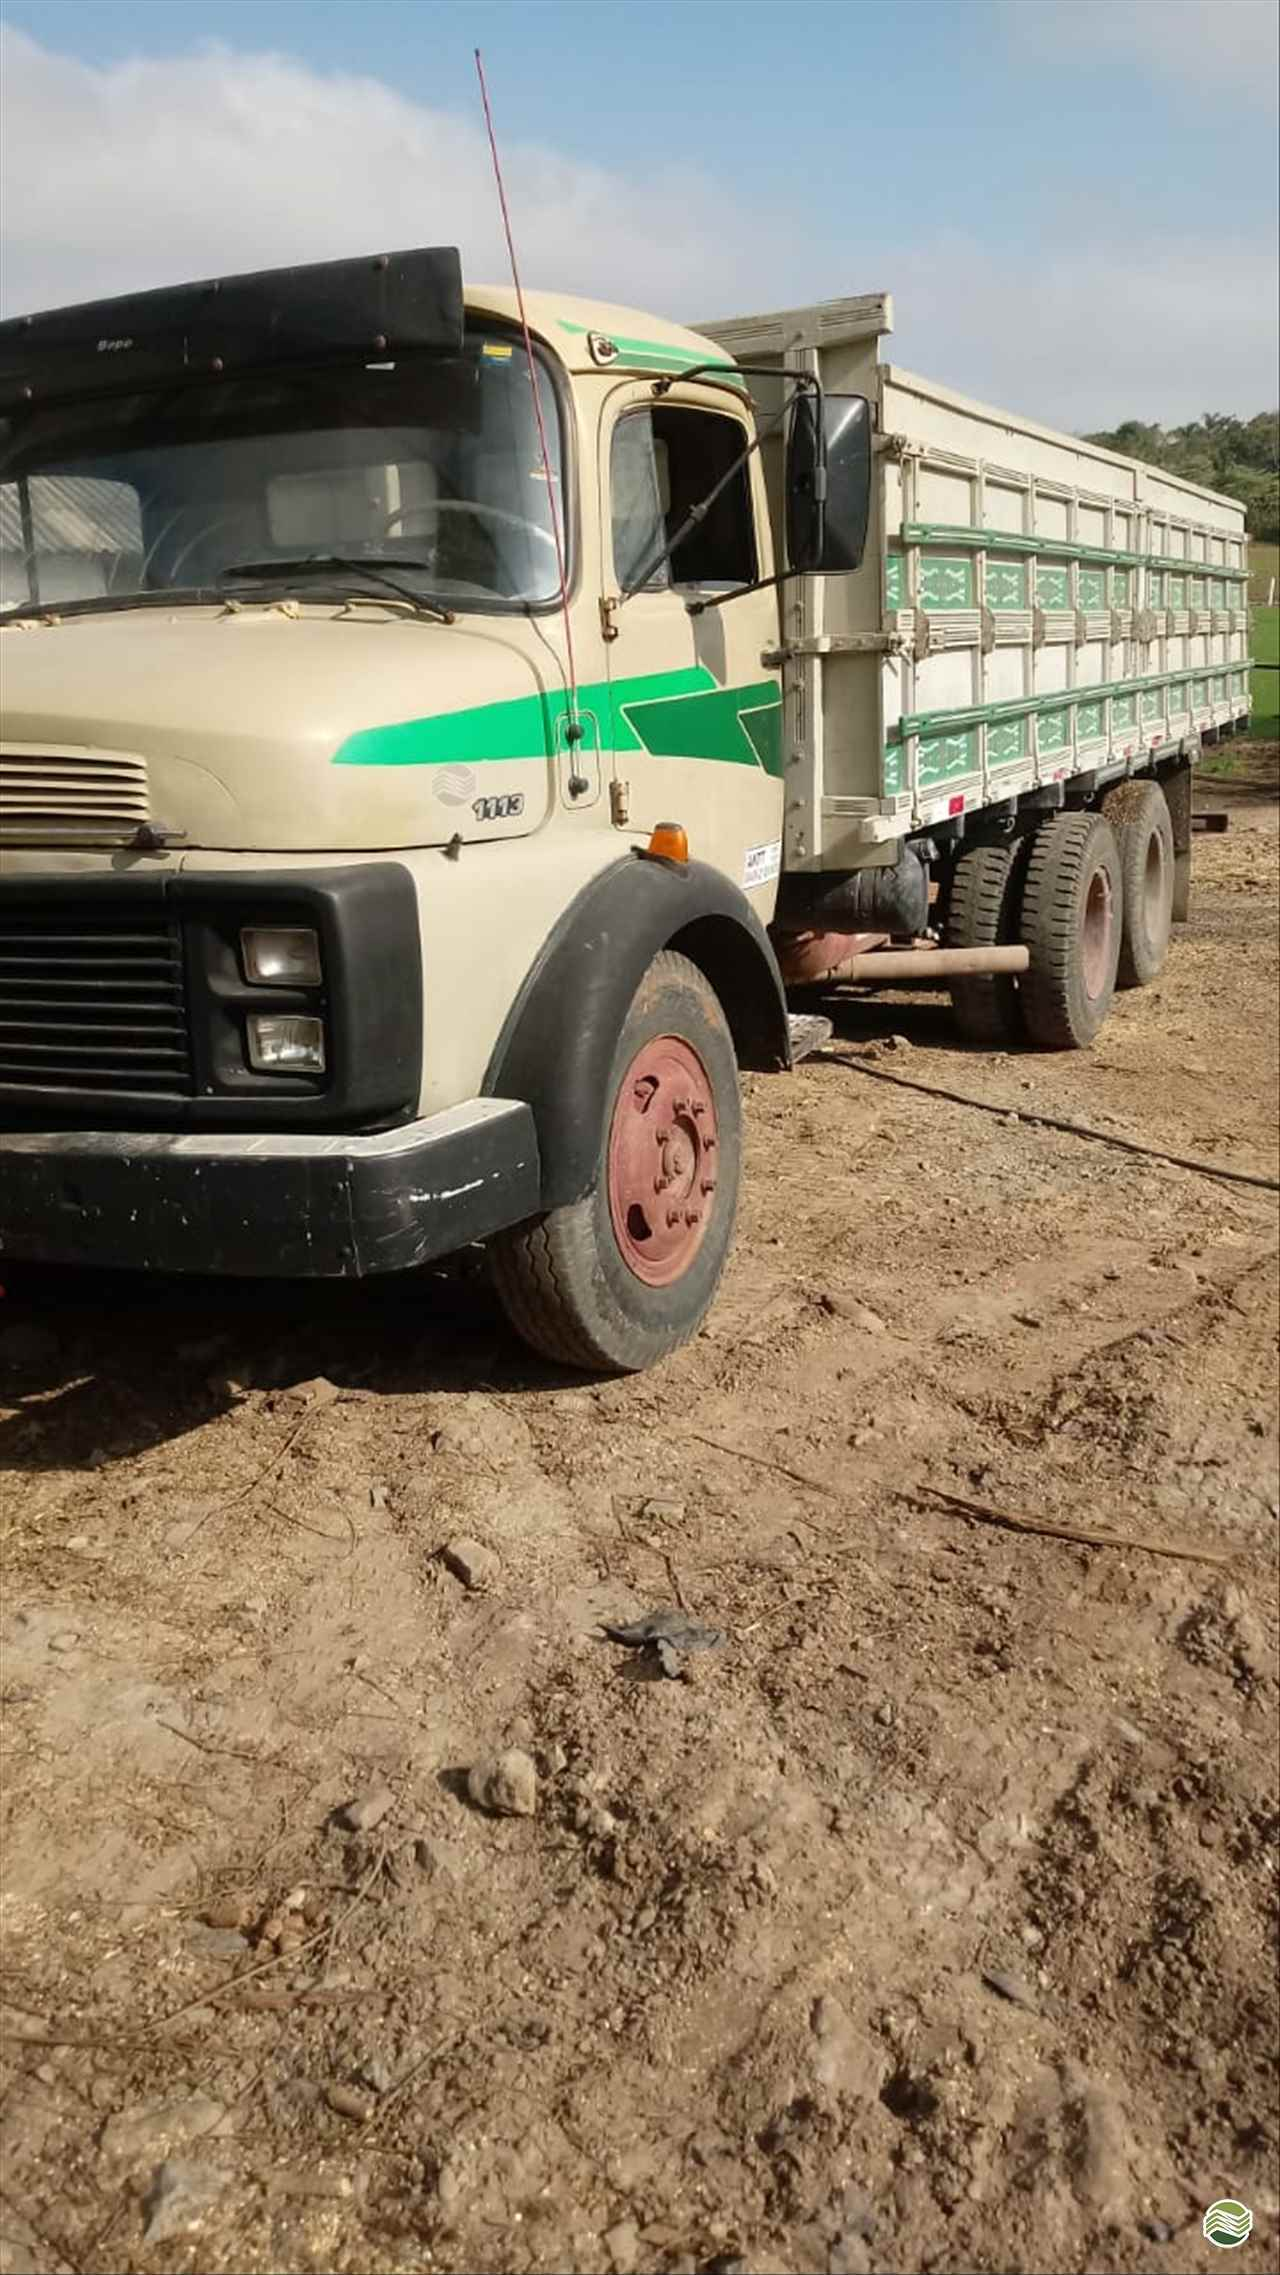 CAMINHAO MERCEDES-BENZ MB 1113 Carroceria Cabine Suplementar Toco 4x2 Dalzotto Equipamentos Agrícolas PRUDENTOPOLIS PARANÁ PR